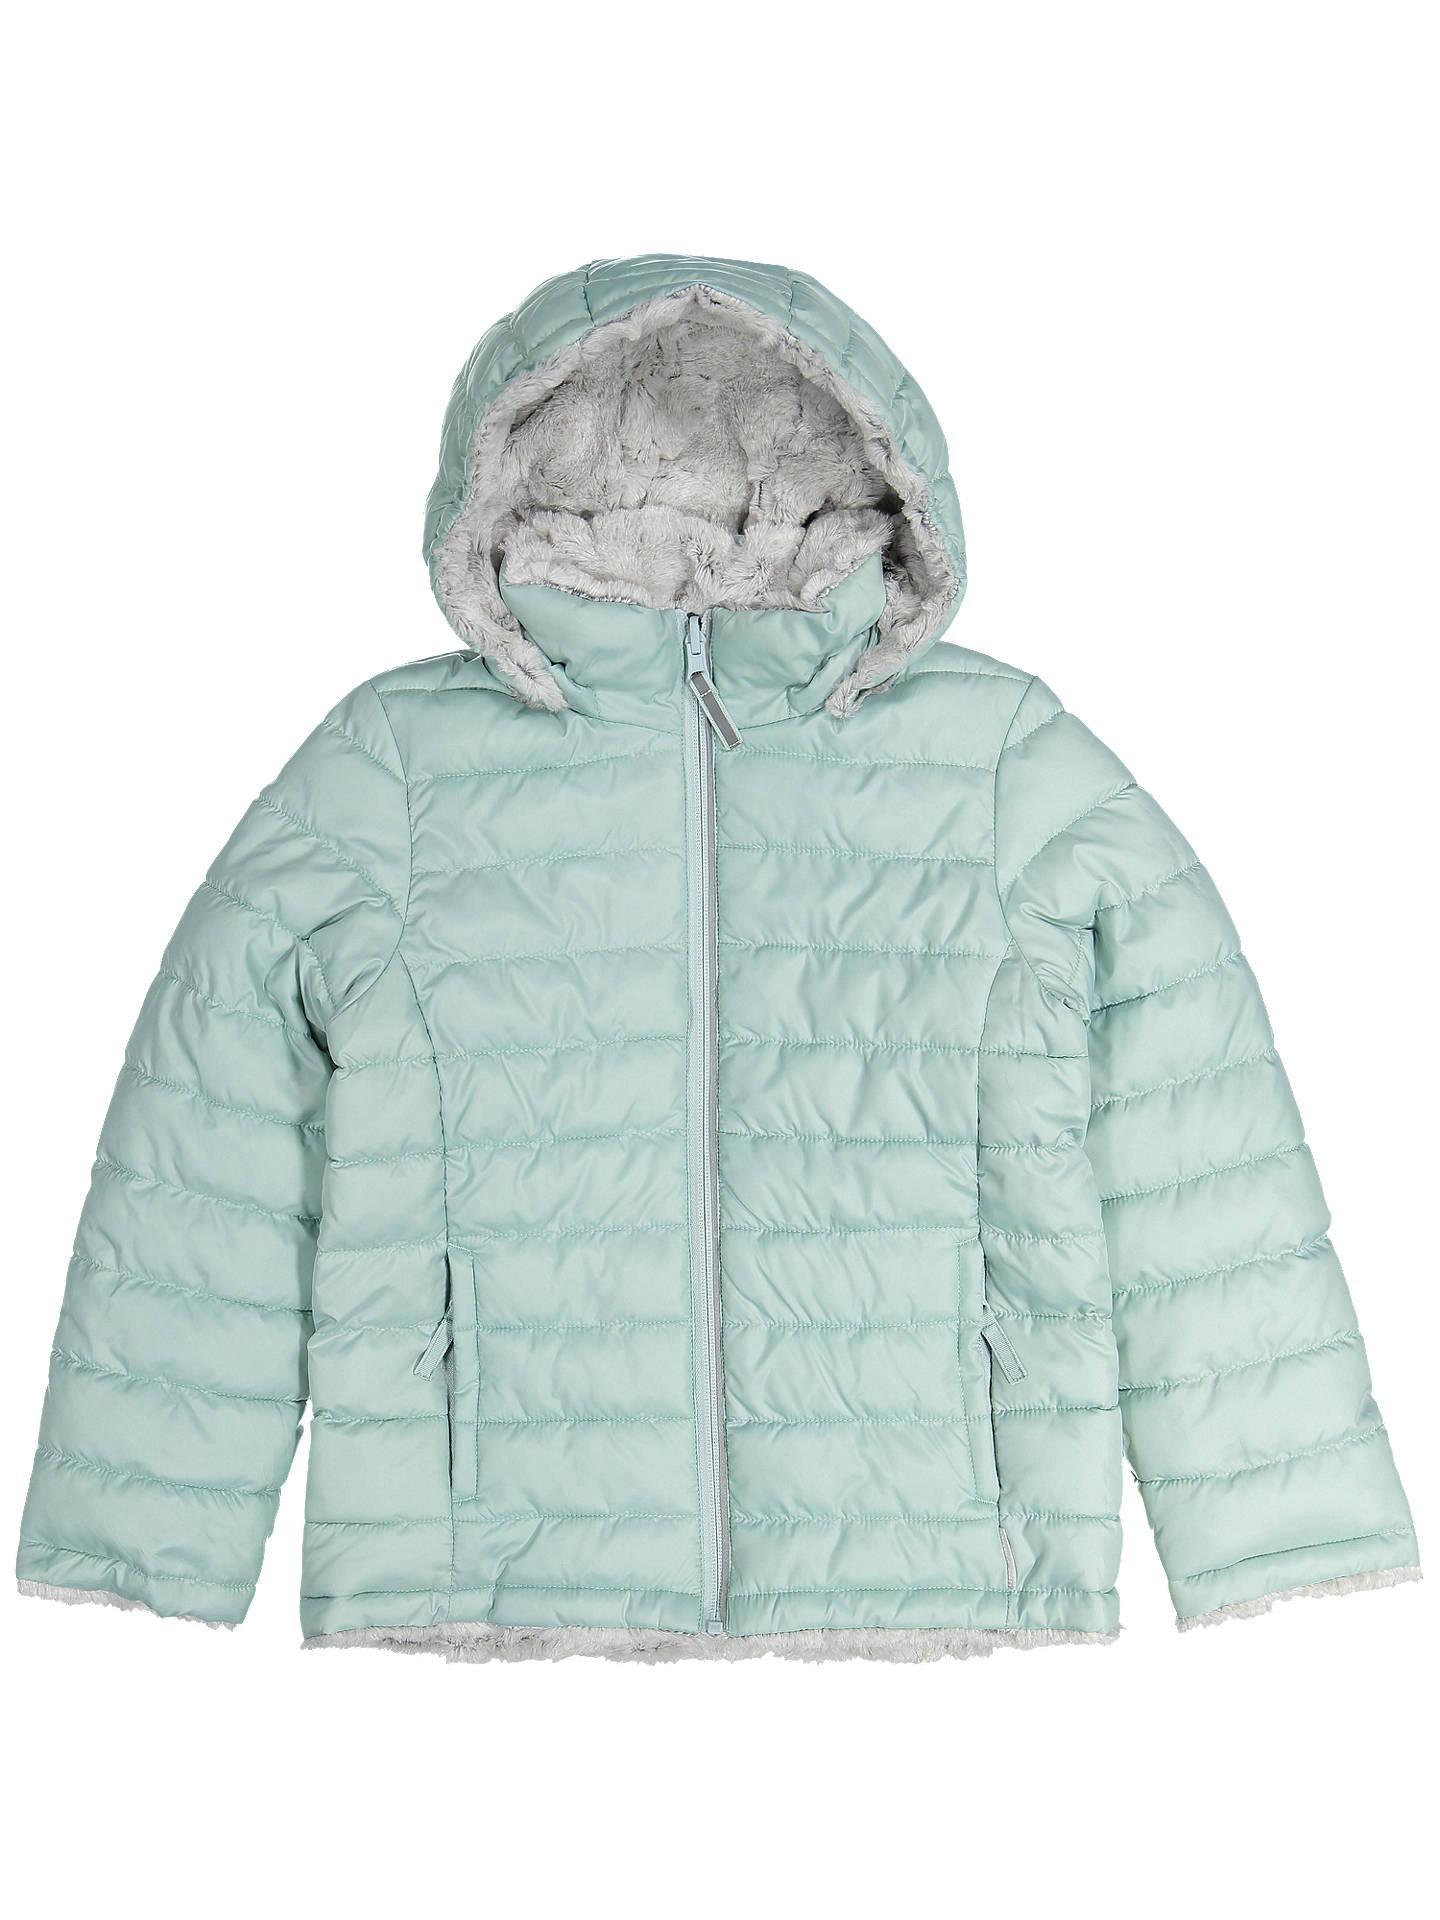 e63c377e8 Polarn O. Pyret Children s Reversible Puffer Jacket